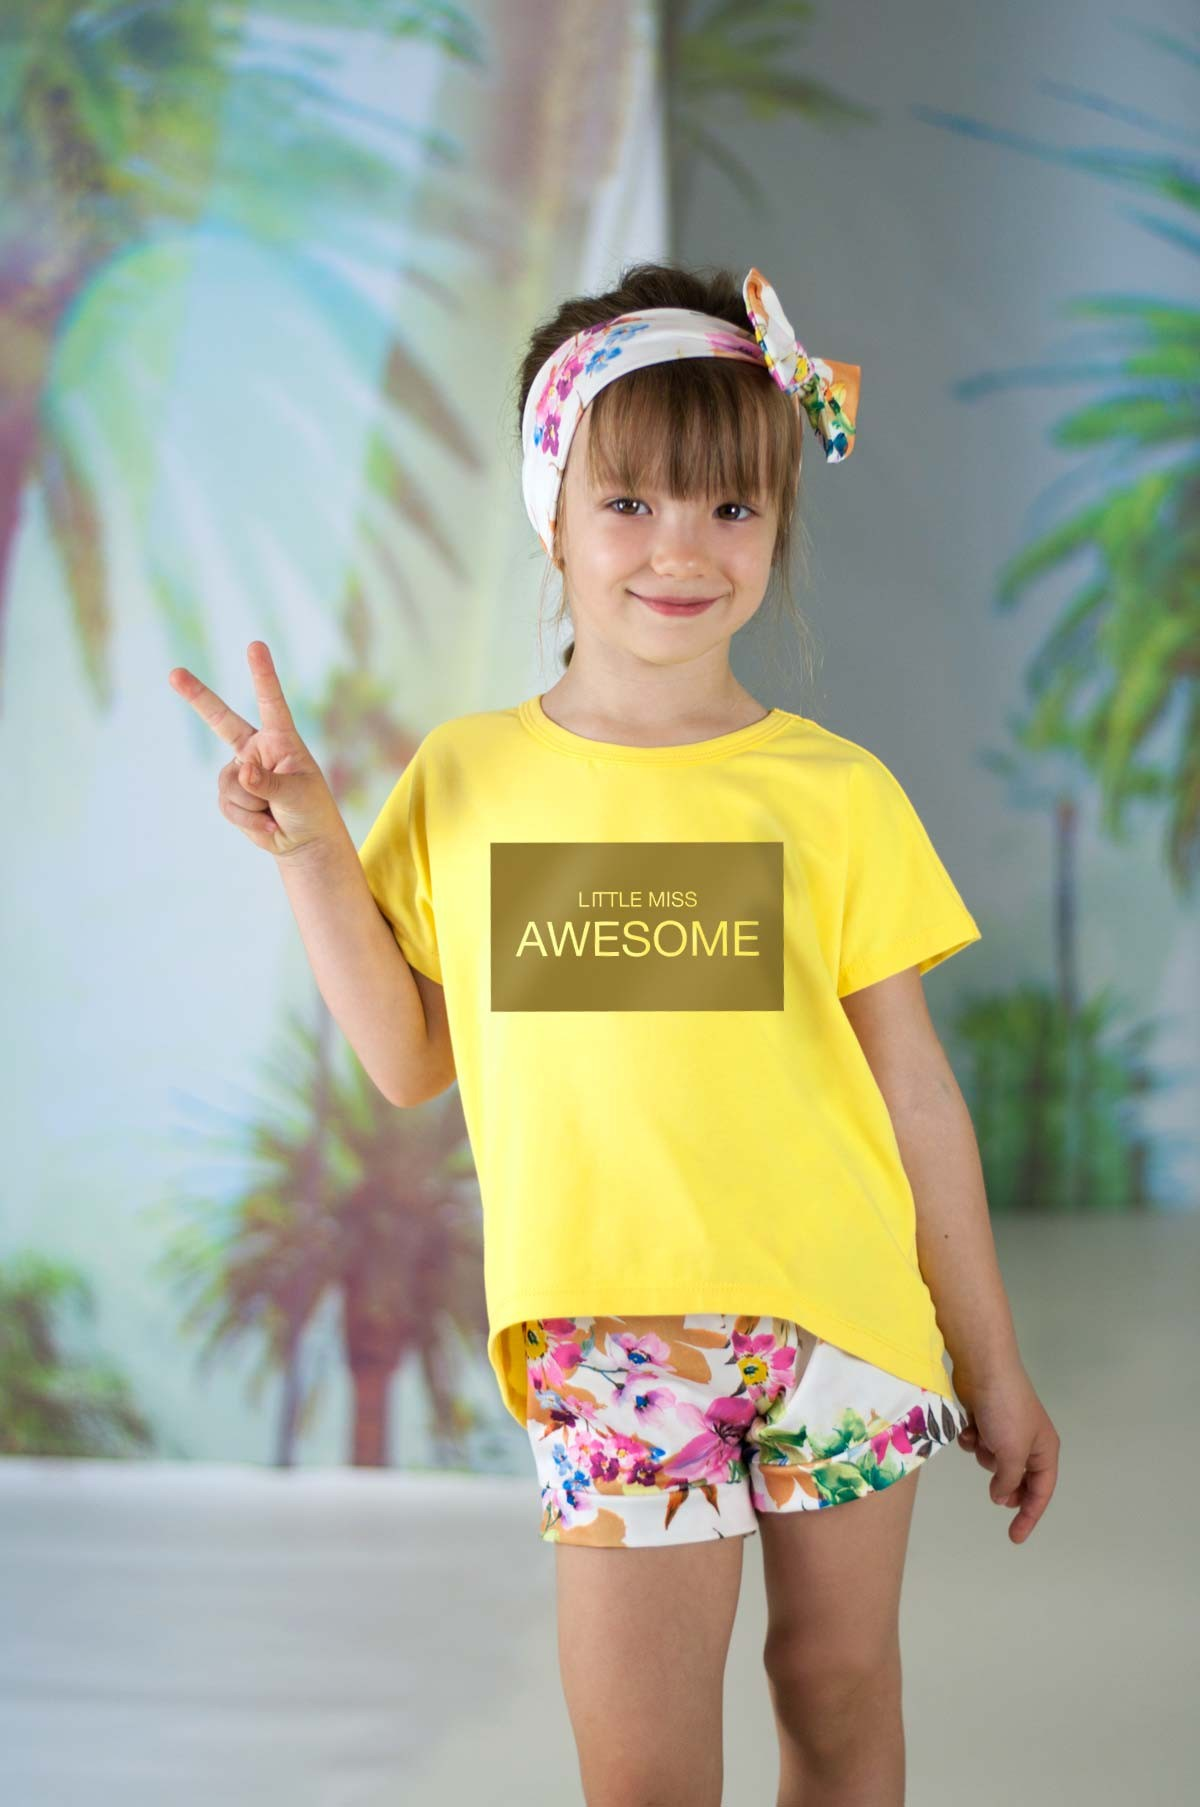 футболка оверсайз желтая с надписью